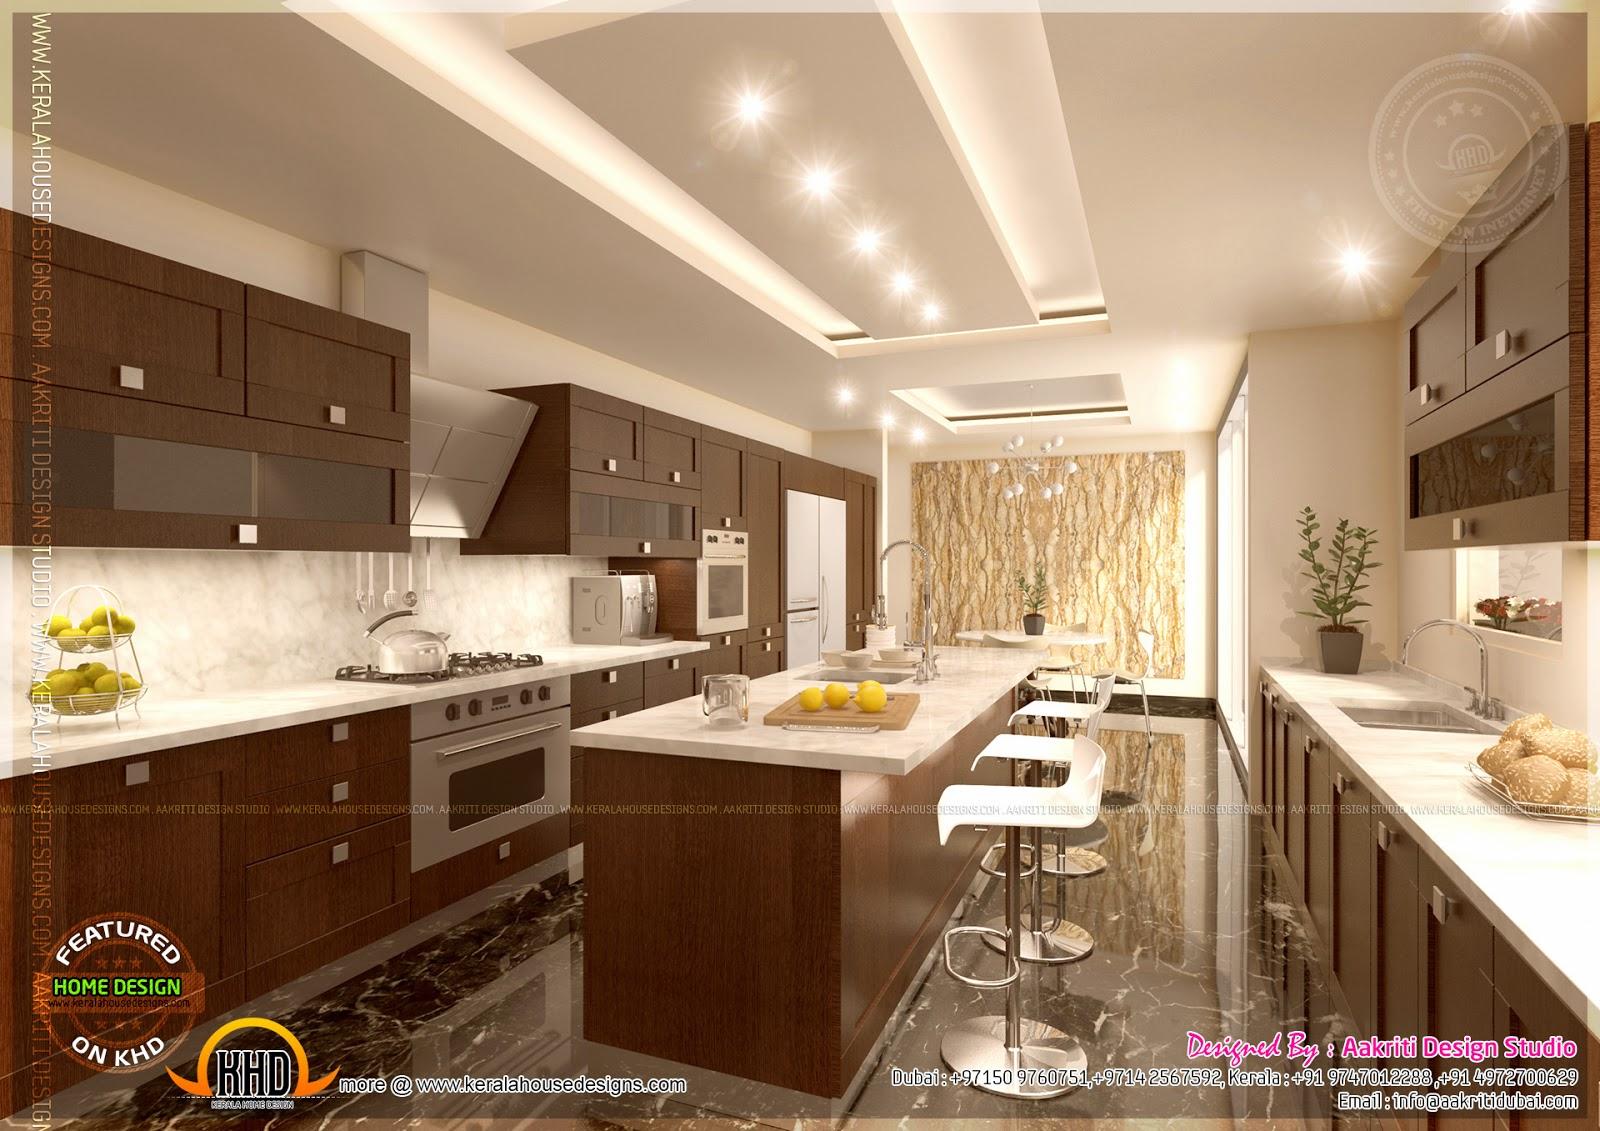 Kitchen designs by Aakriti Design Studio  Kerala home